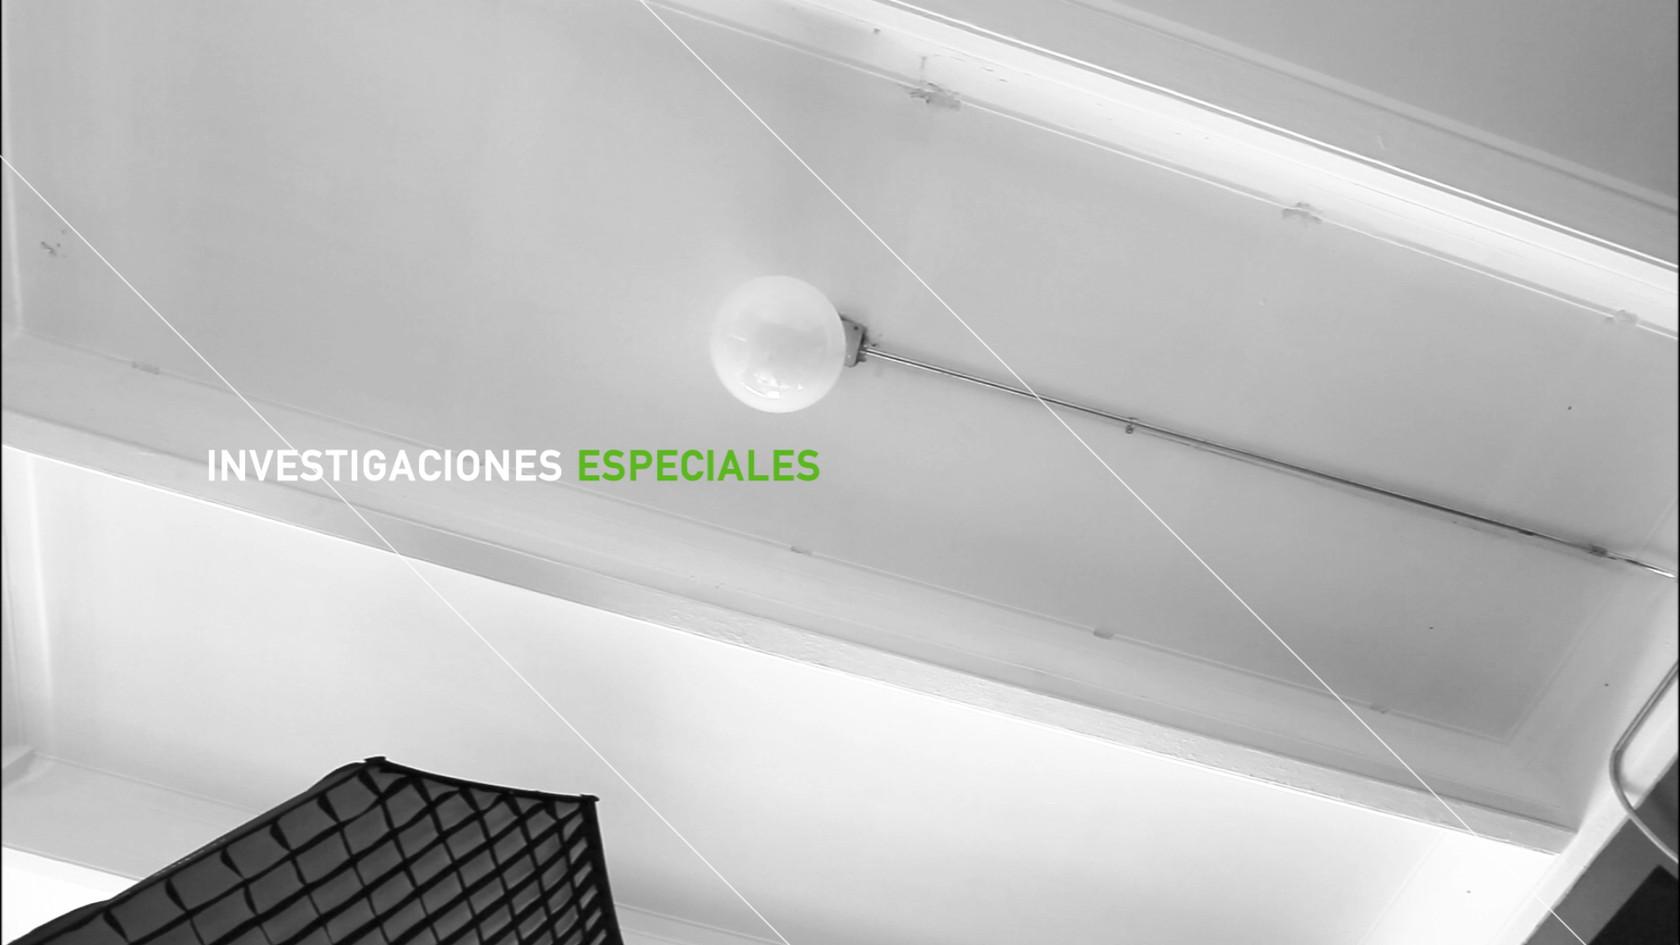 OPENING REPORTEROS 2013 (0.00.10.18).jpg